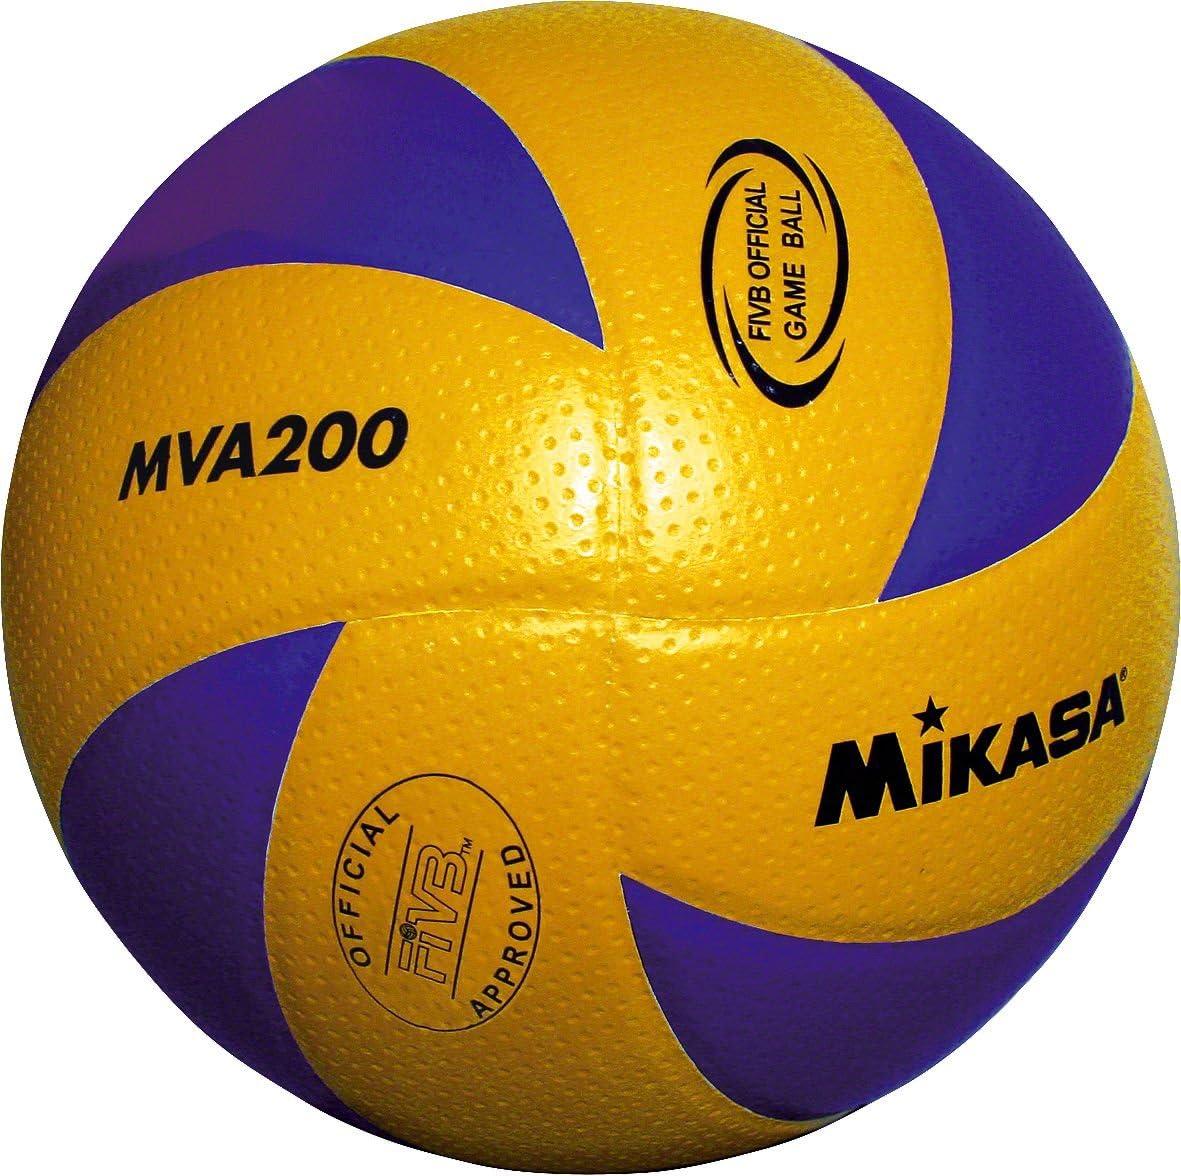 Mikasa MVA 200 - Pelota para Voleibol (Talla 5), Multicolor ...